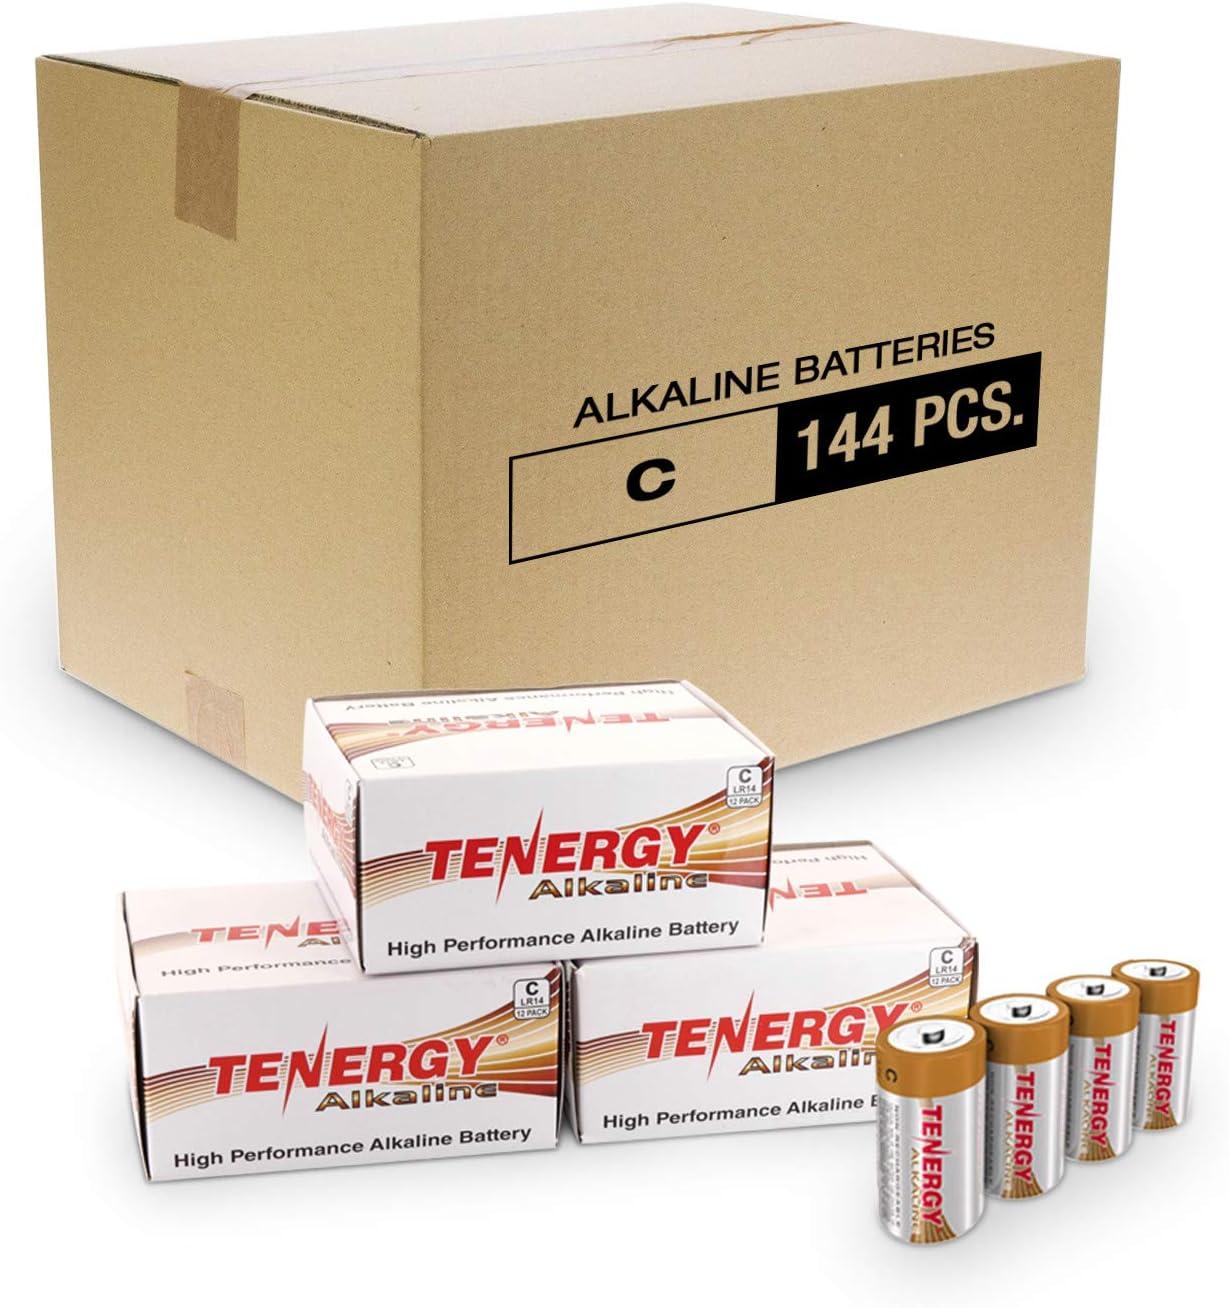 Tenergy 1.5V C Alkaline LR14 High Popular Latest item overseas Performance Battery Non-Rec